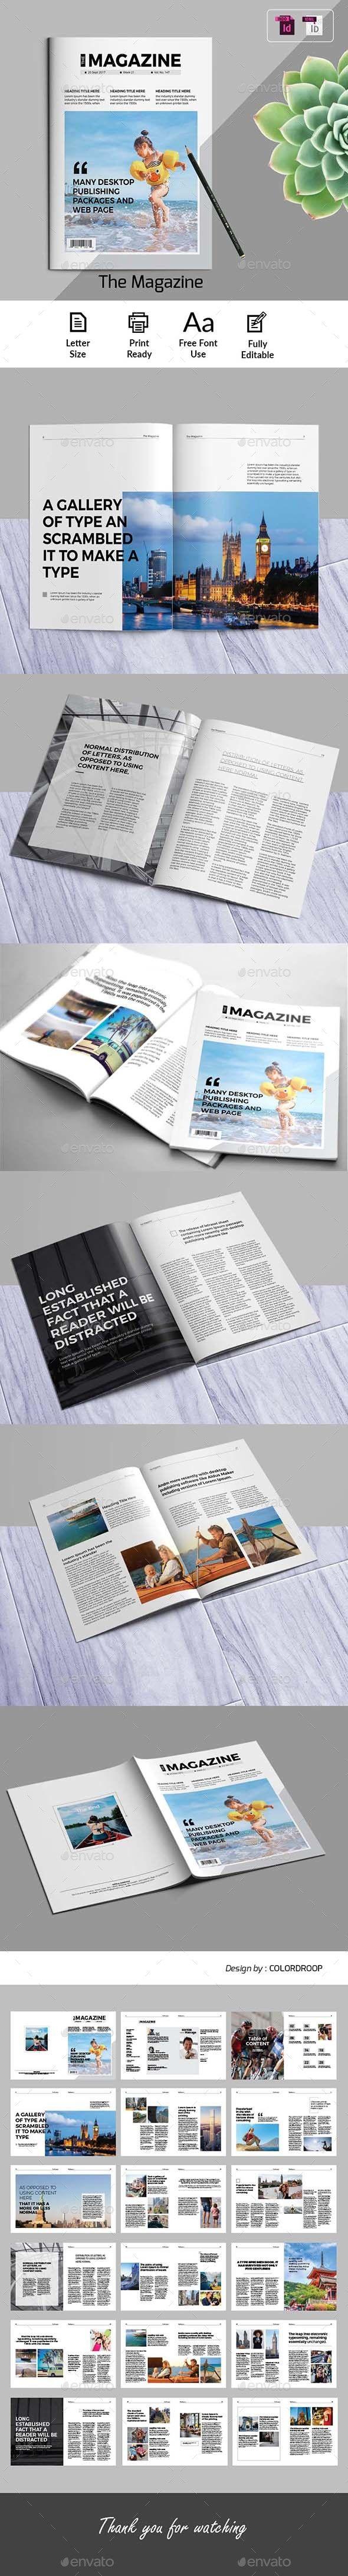 162 best magazine grids templates images on pinterest